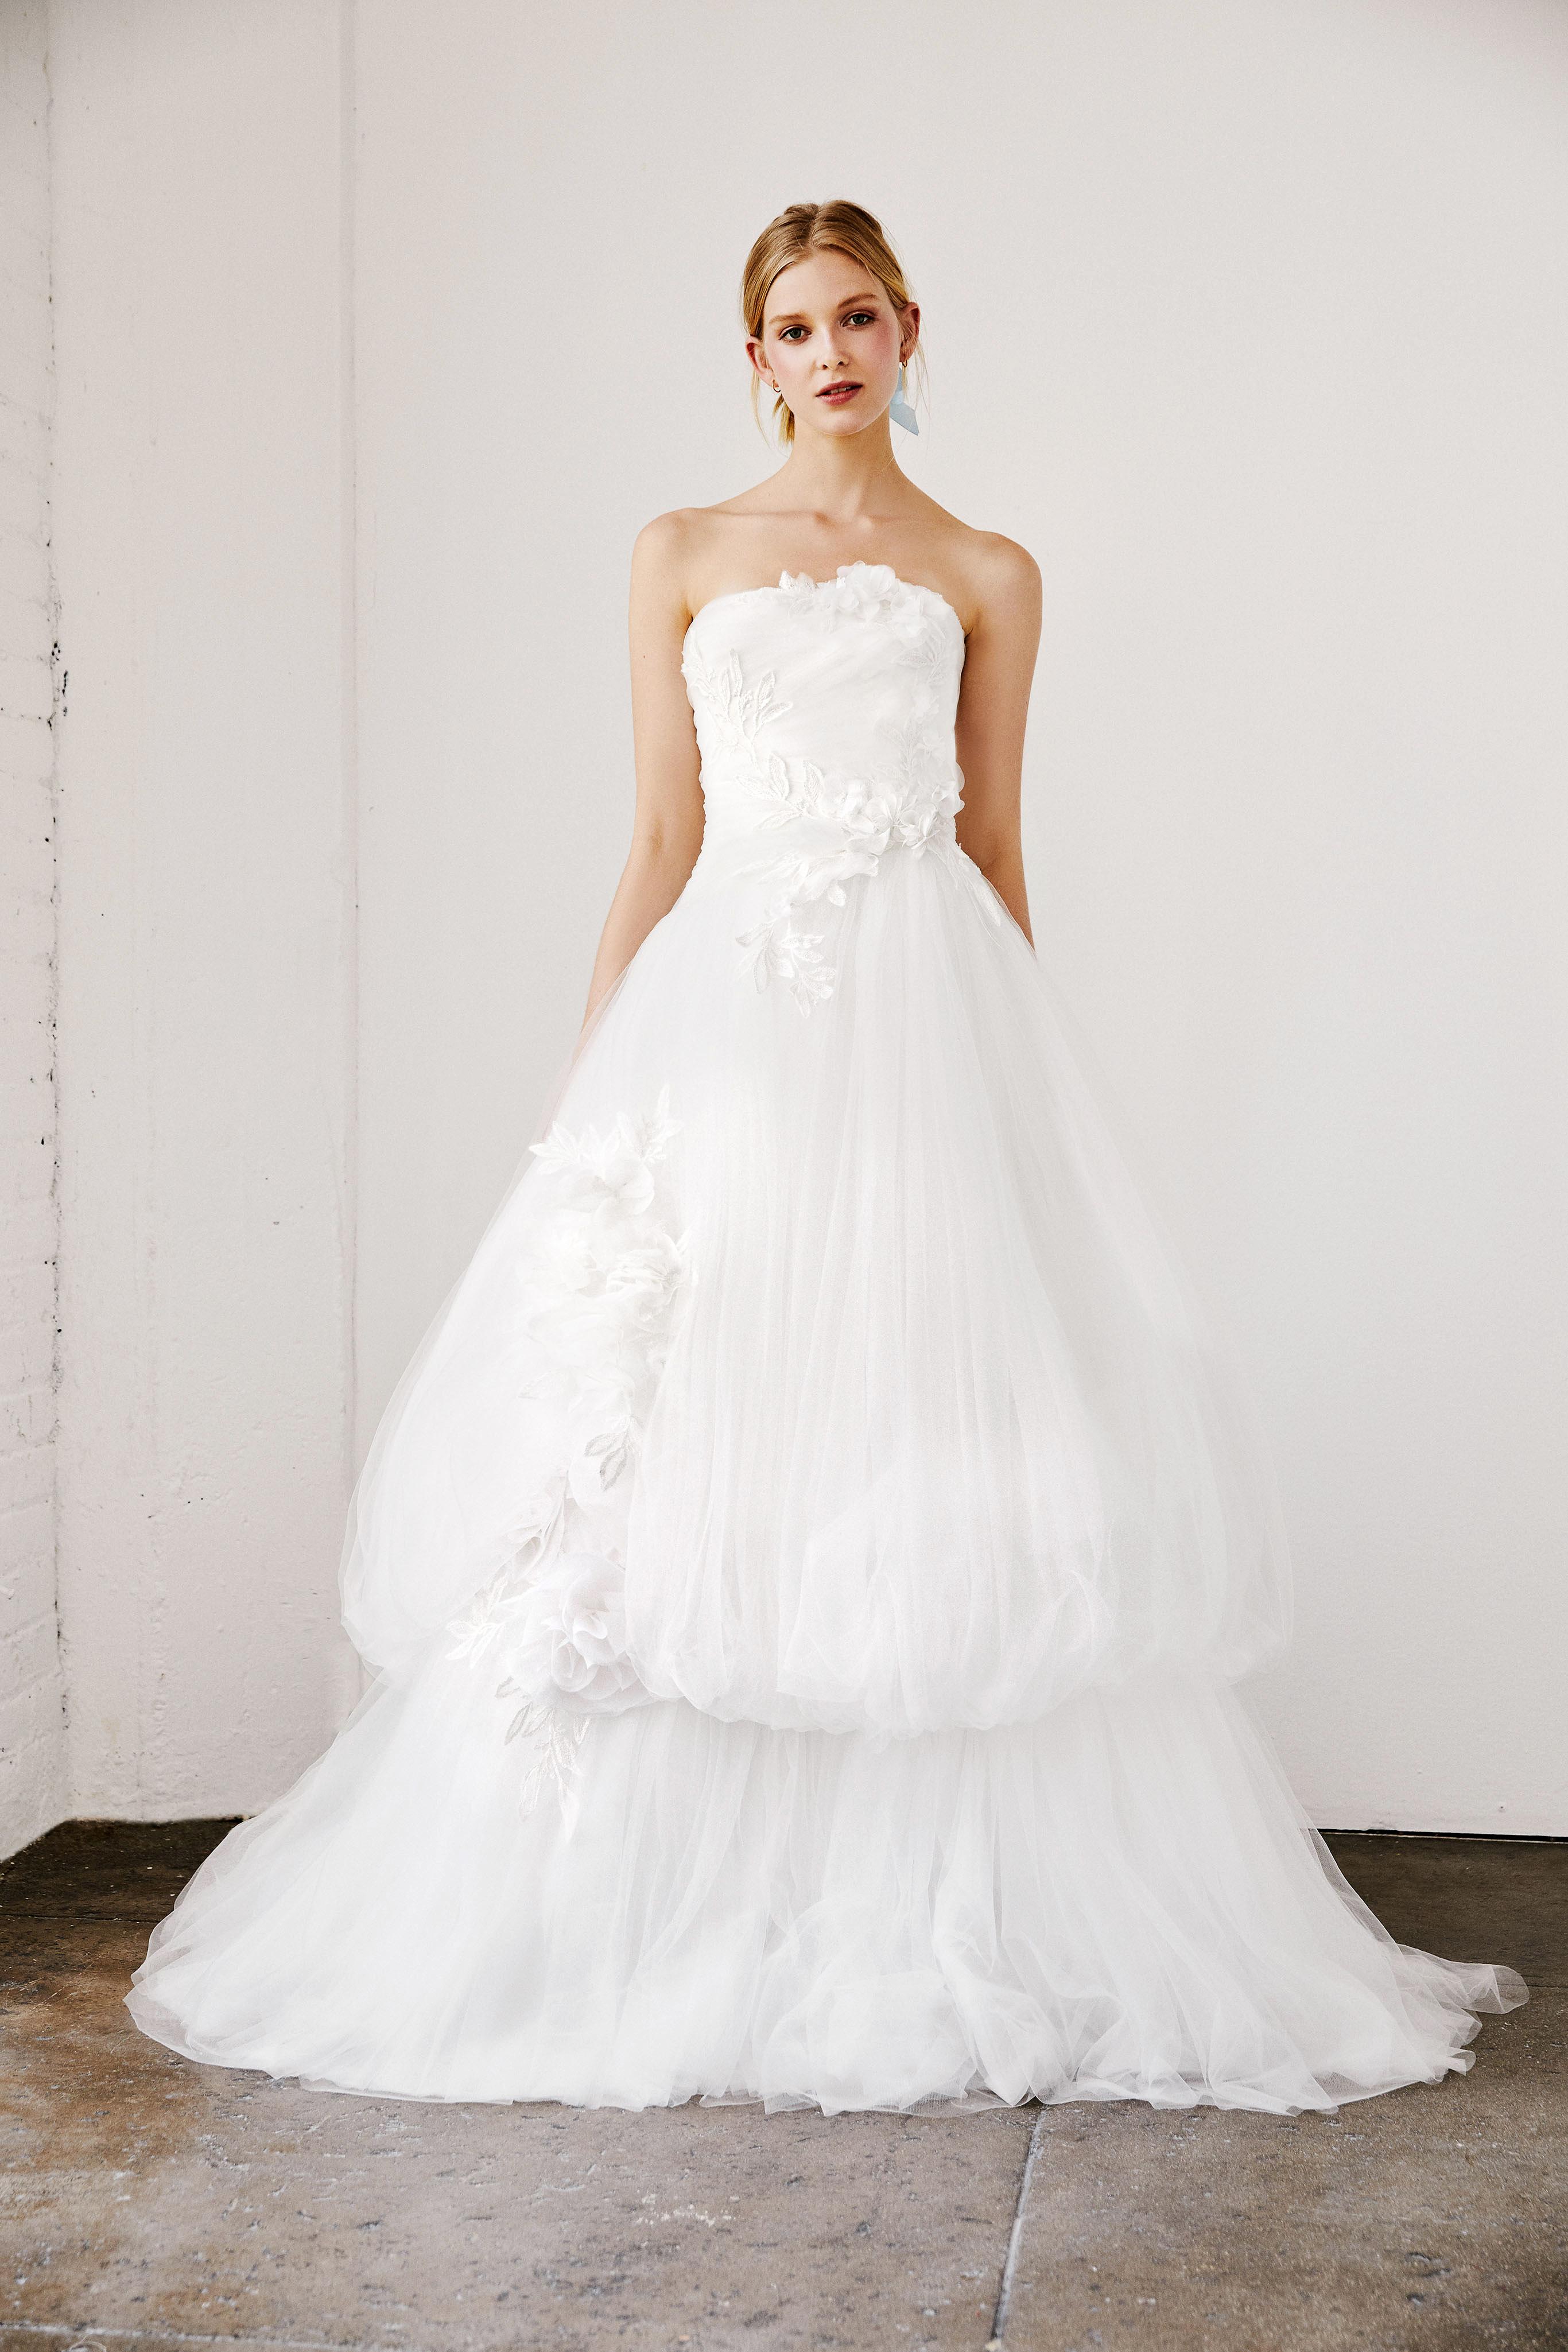 tadashi shoji wedding dress spring 2019 strapless tulle floral applique